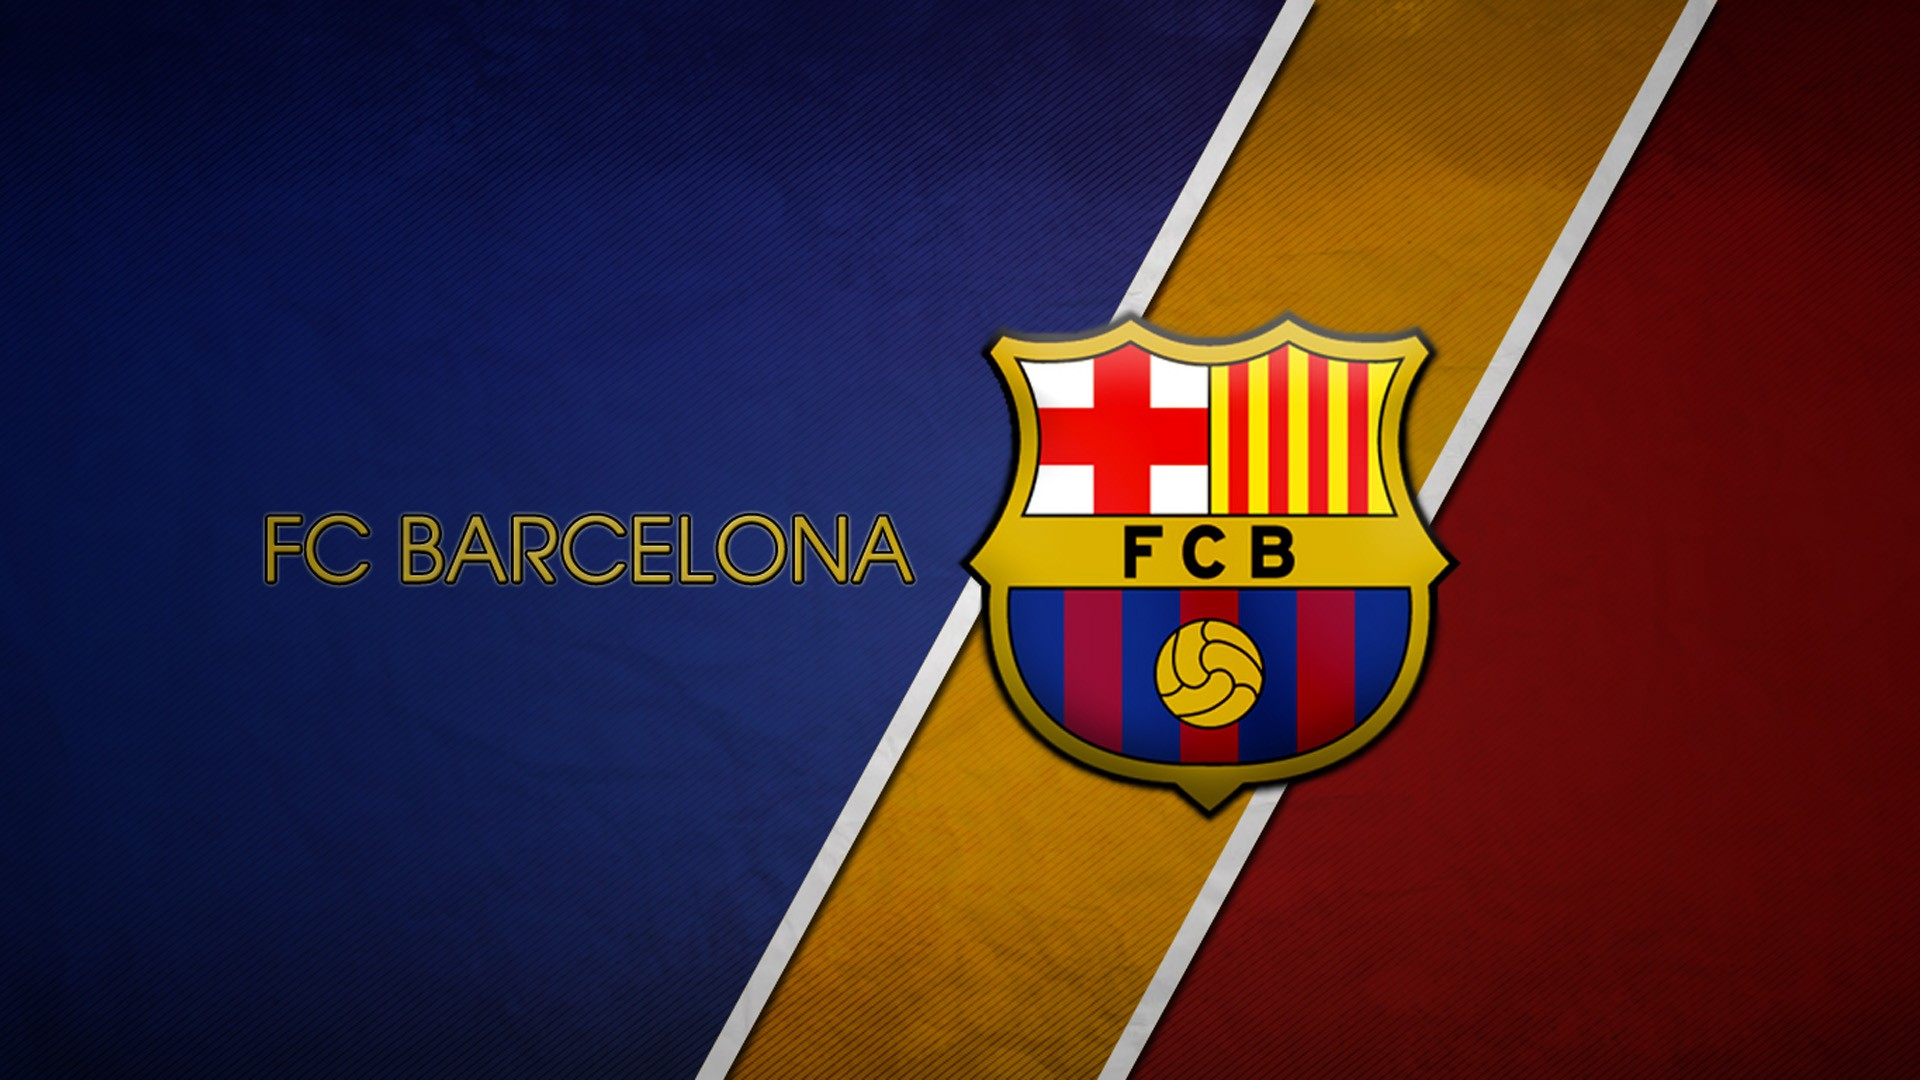 Fc Barcelona Football Logo Full HD Wallpaper 5319 1920x1080